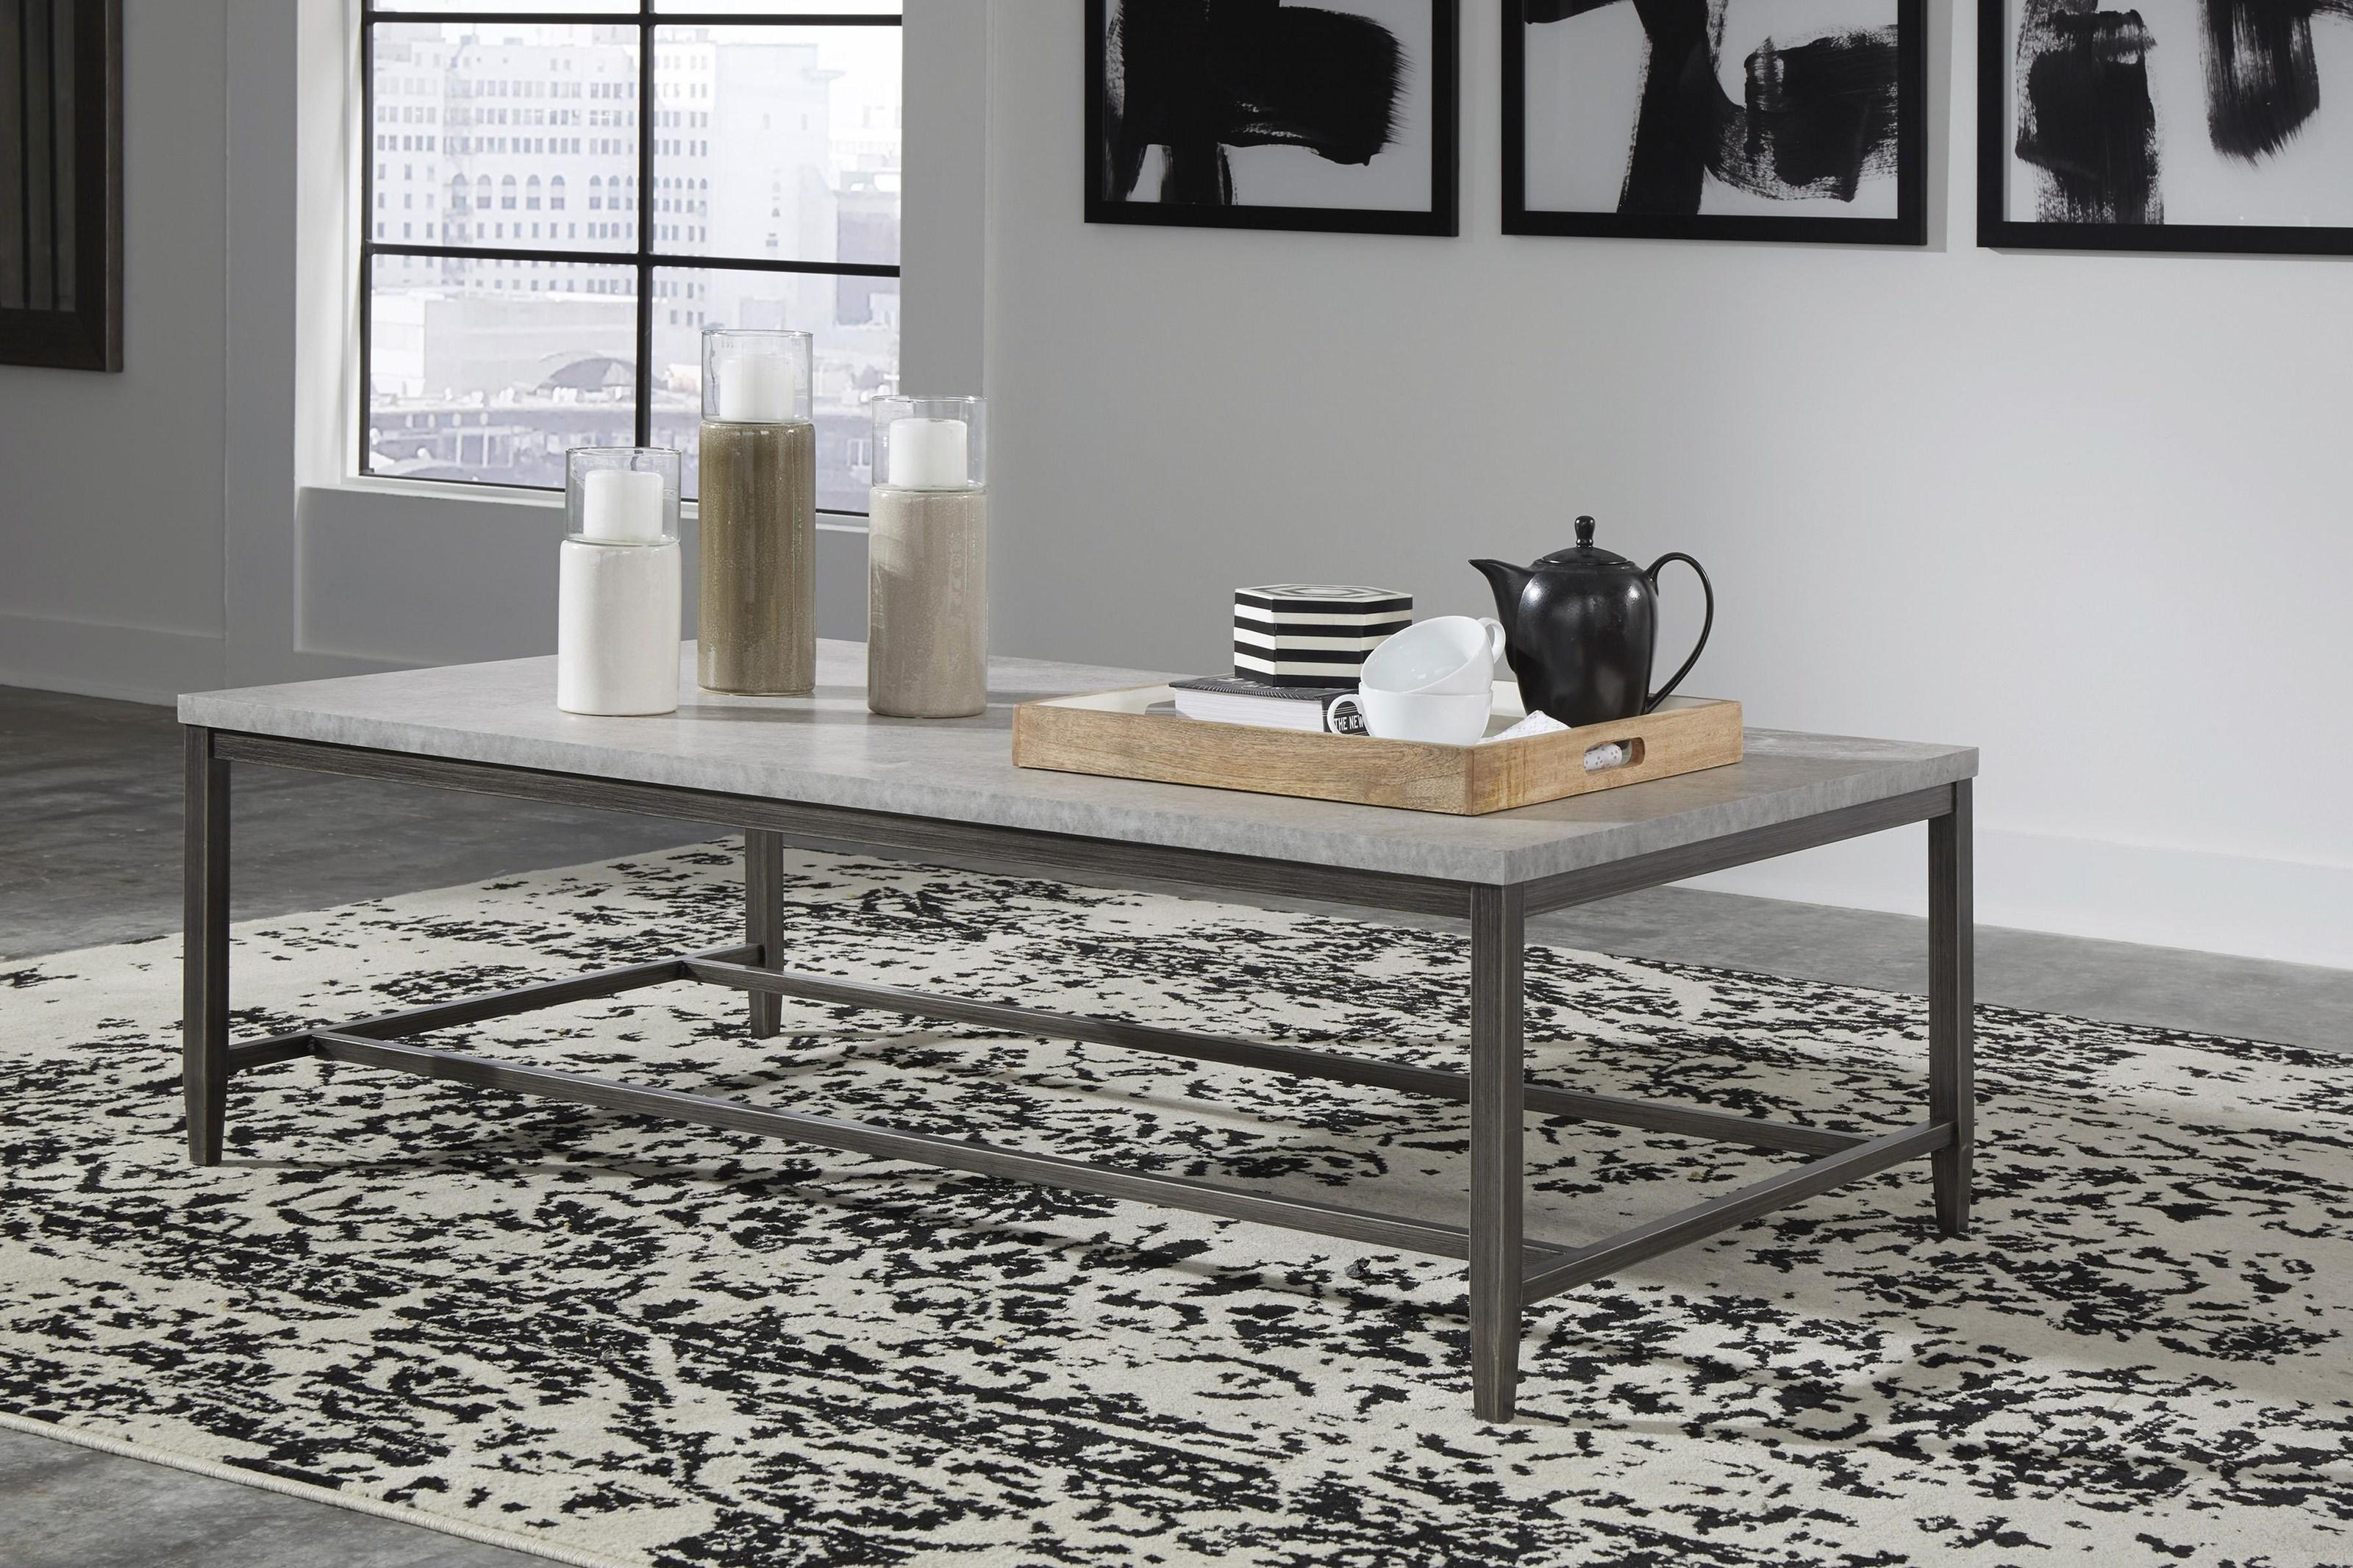 Shybourne 3 Piece Coffee Table Set by Signature Design by Ashley at Sam Levitz Furniture